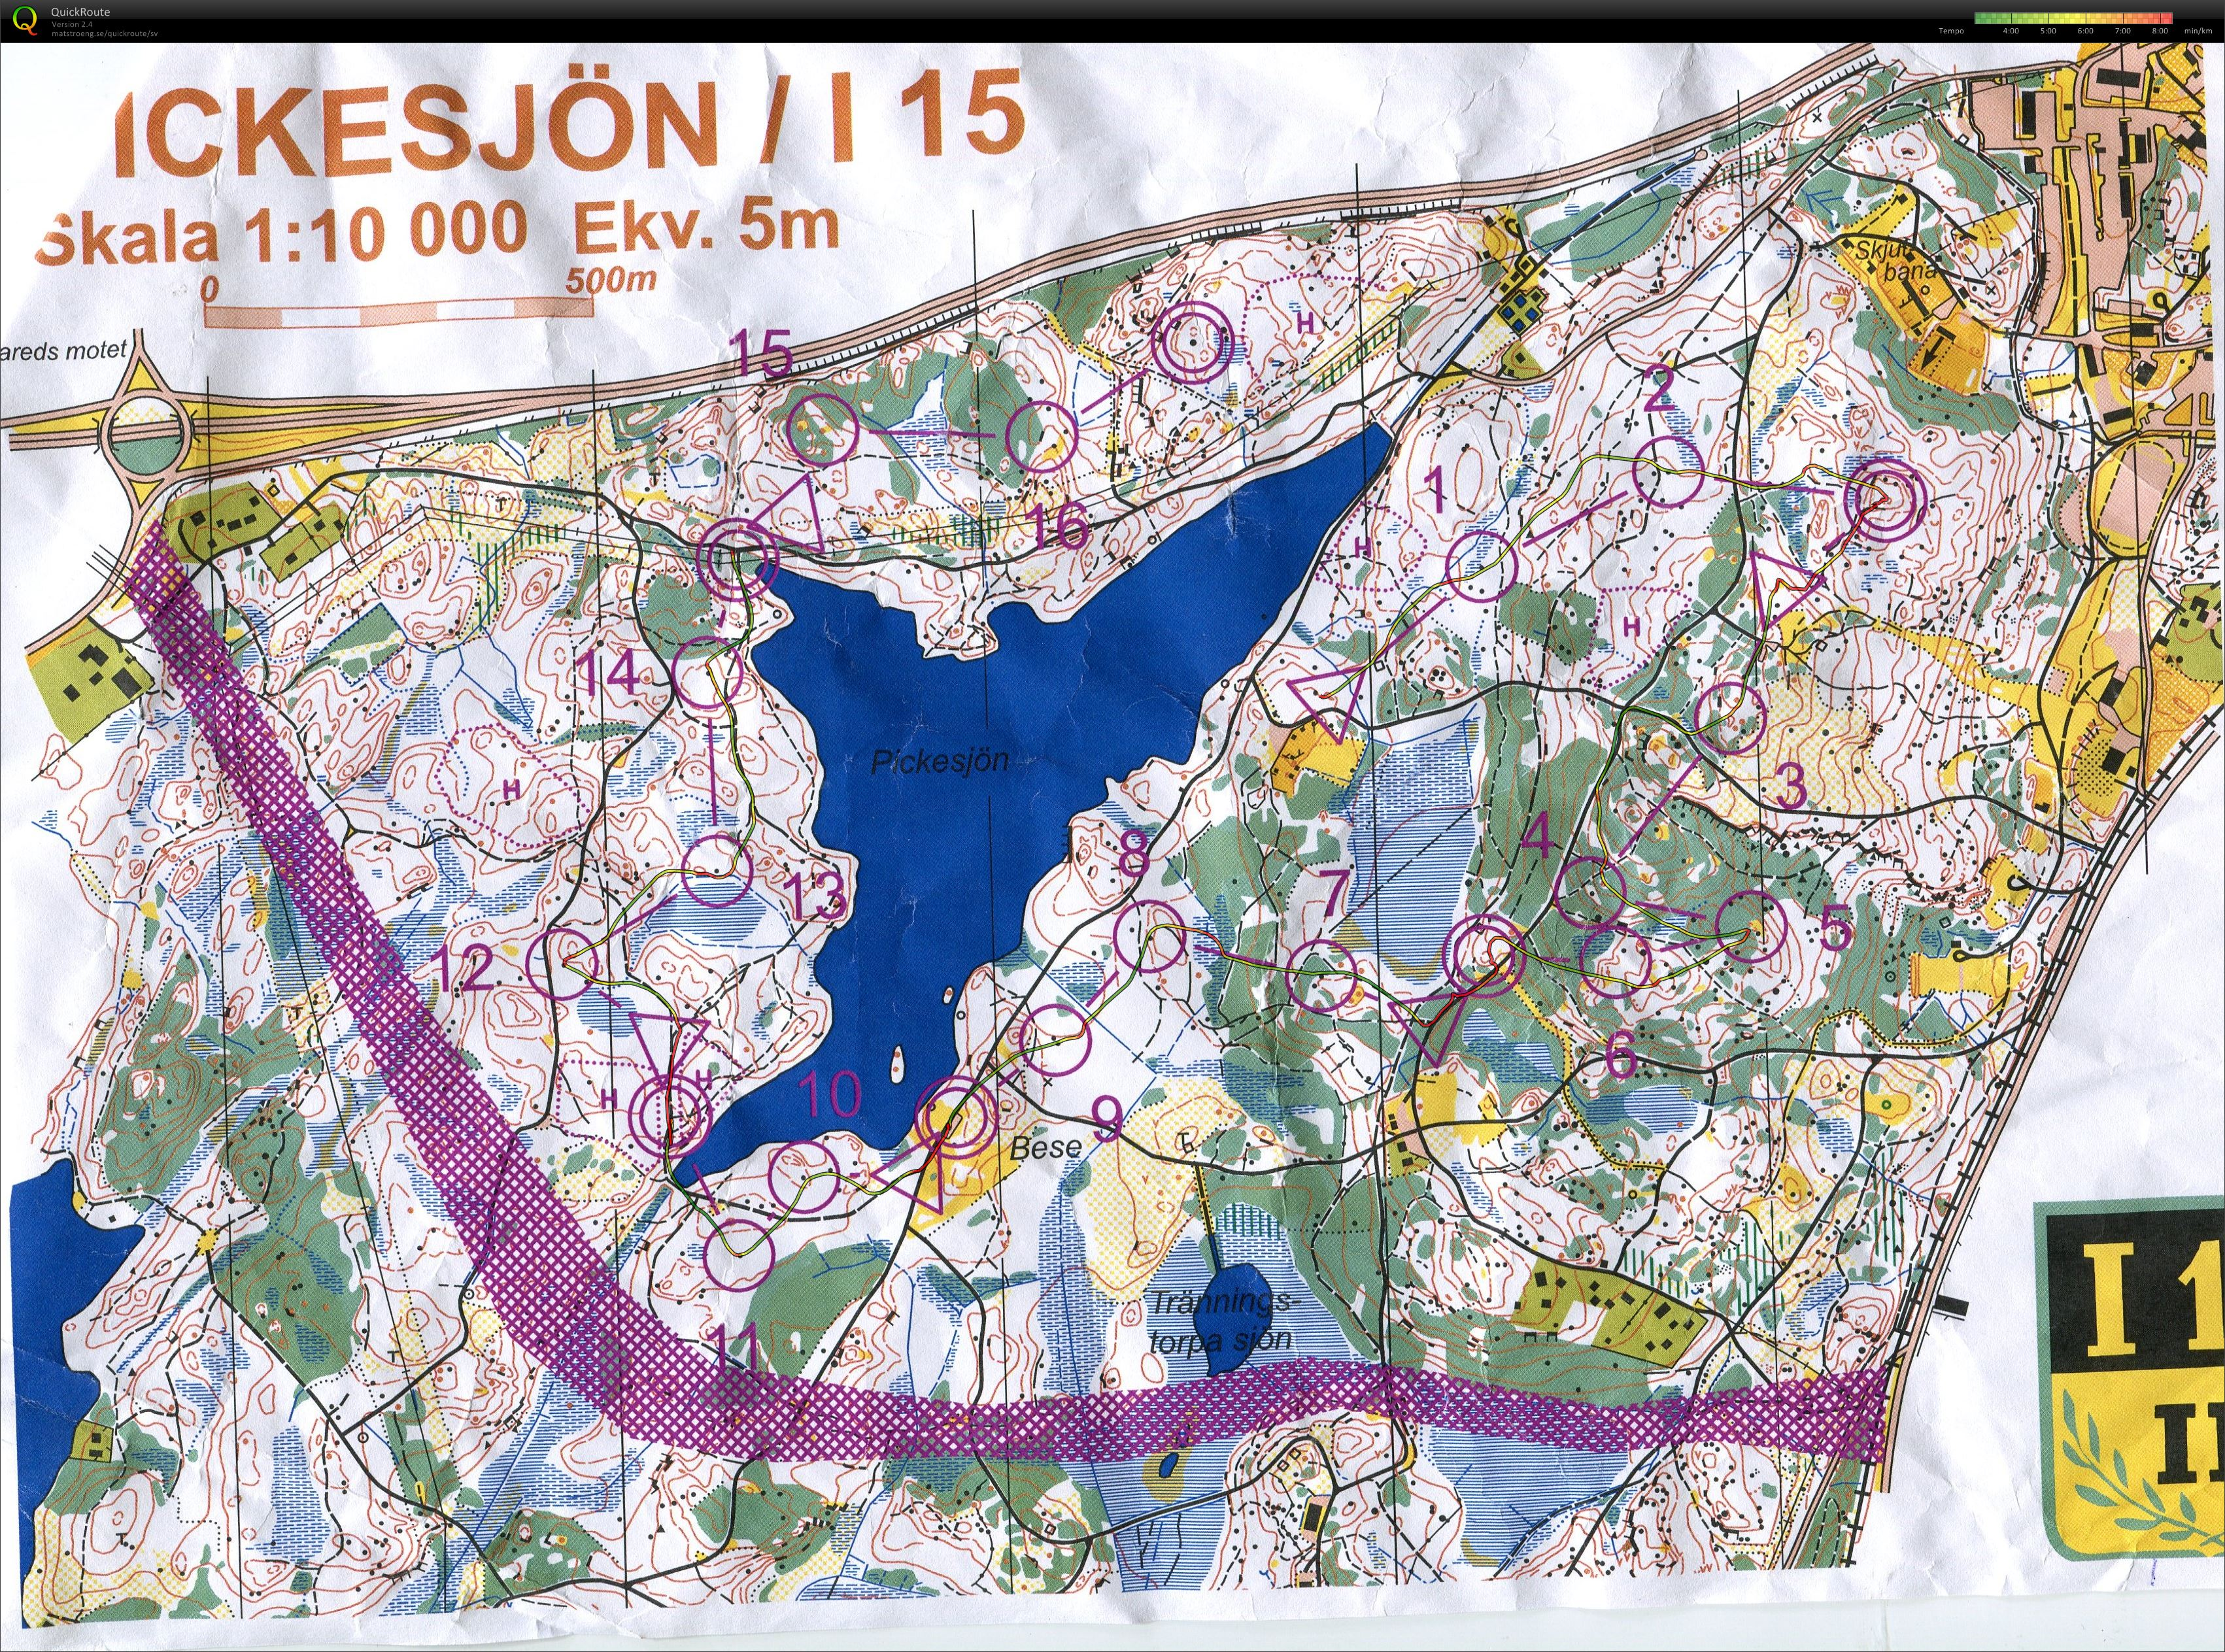 pickesjön karta Mitt digitala kartarkiv :: OL intervaller Pickesjön (03.09.2015) pickesjön karta